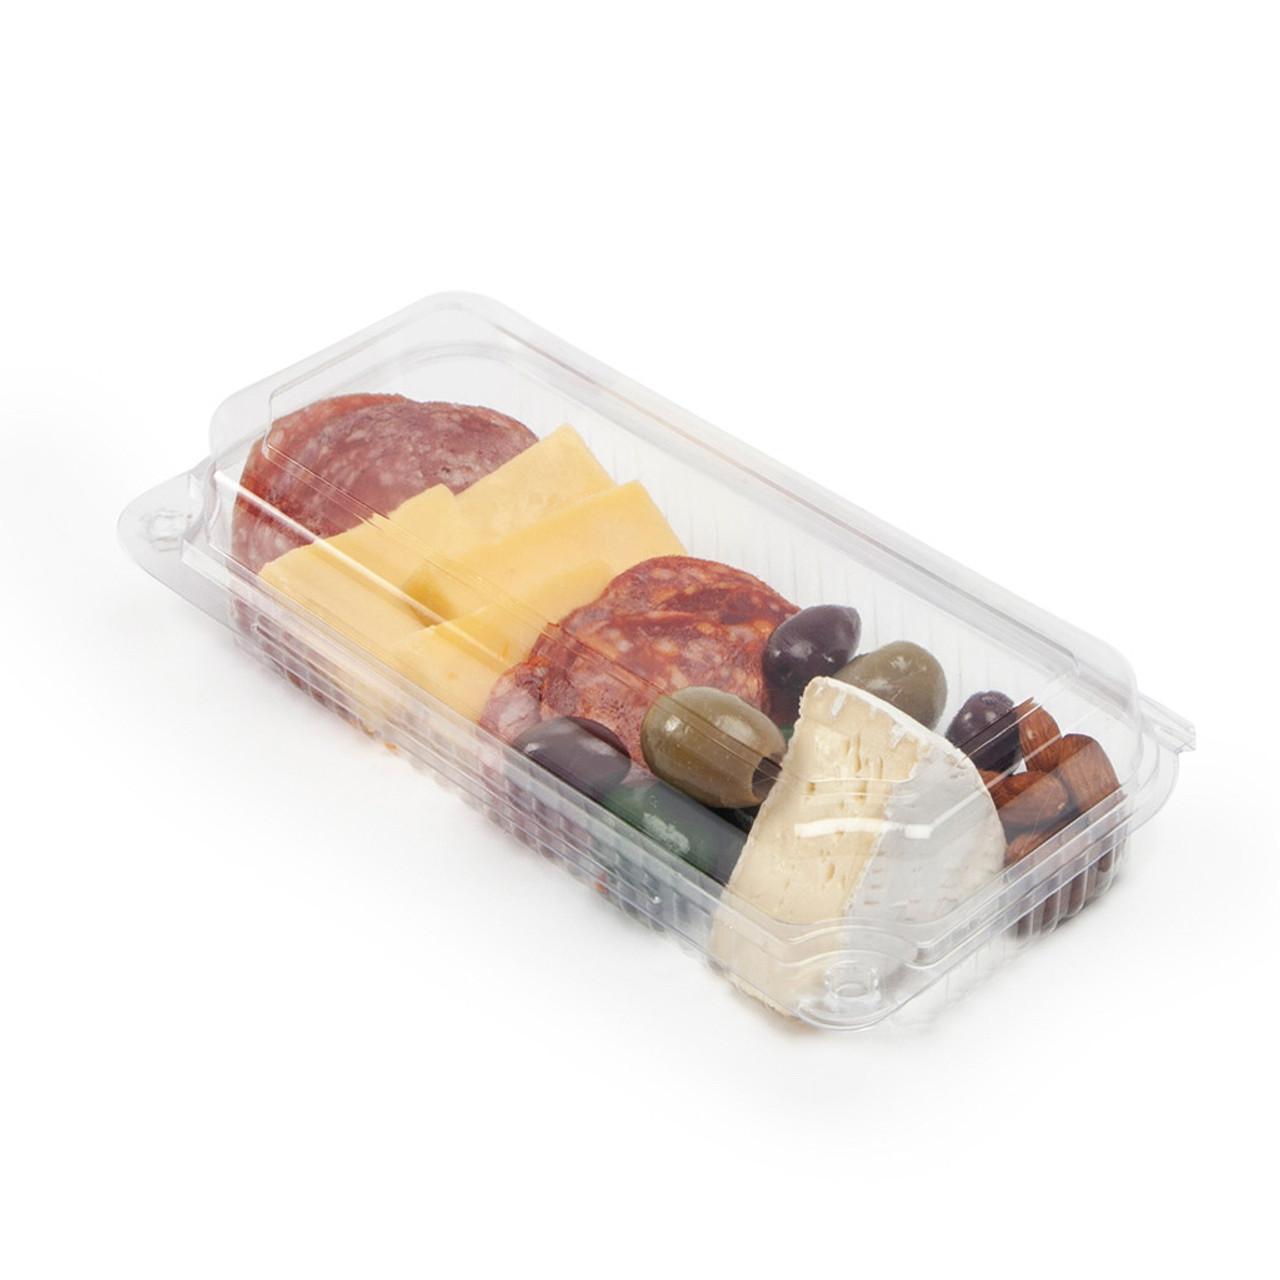 General Purpose Sushi, Deli Container